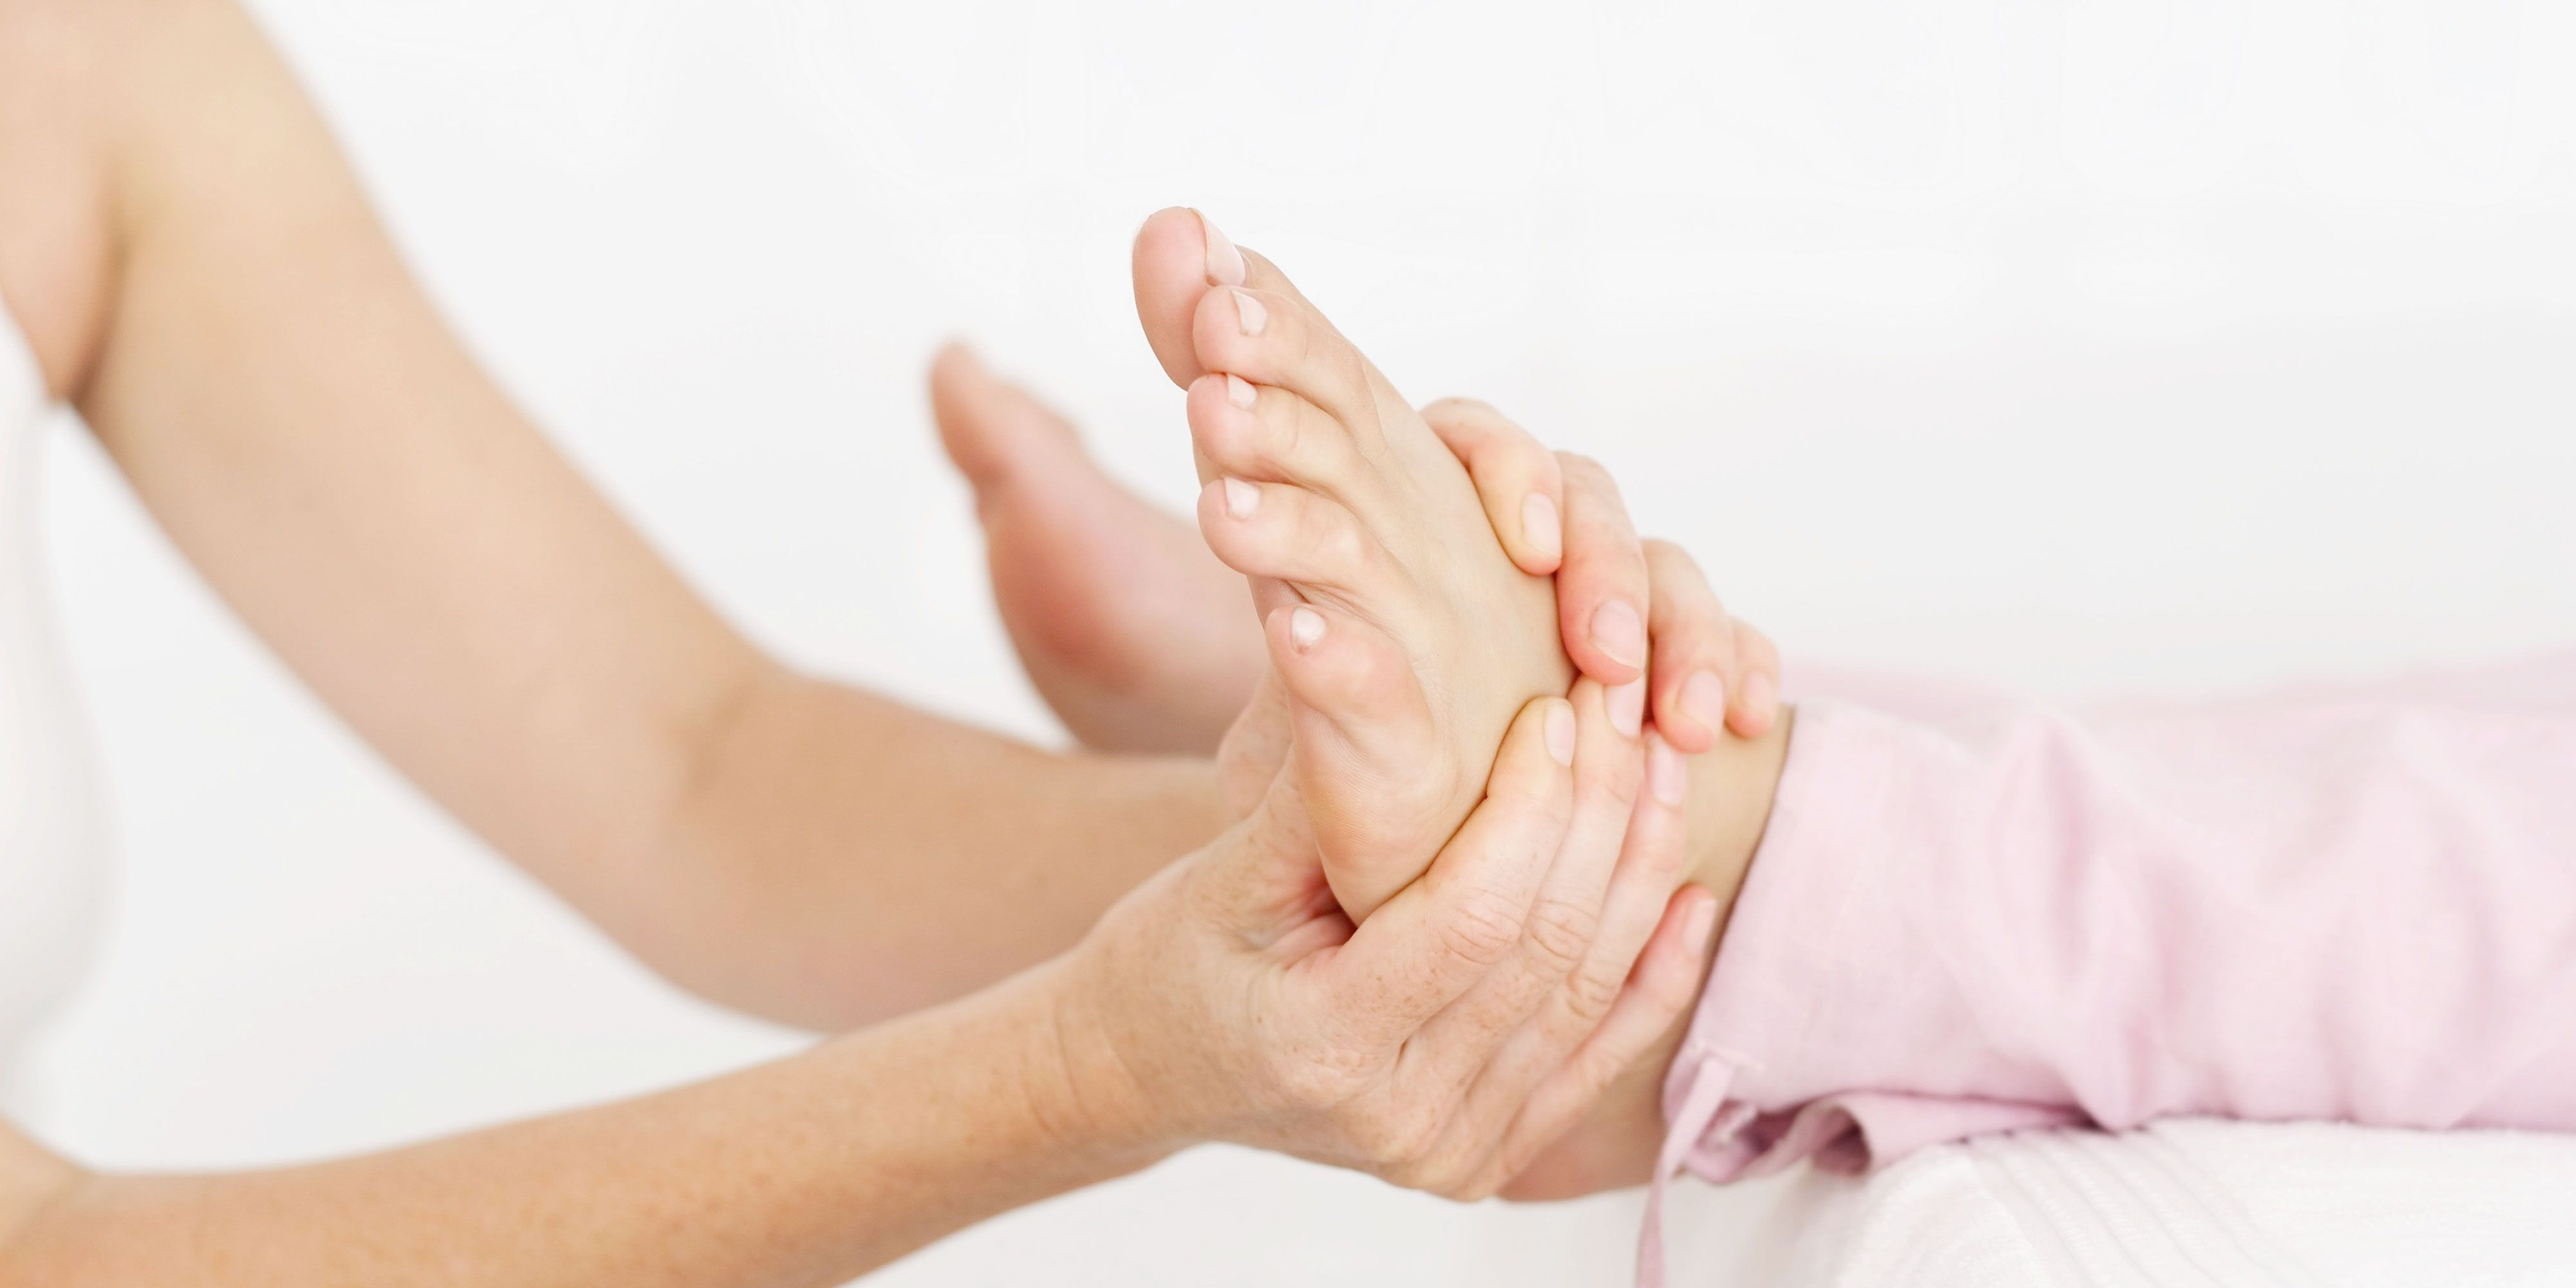 Matures giving hand jobs